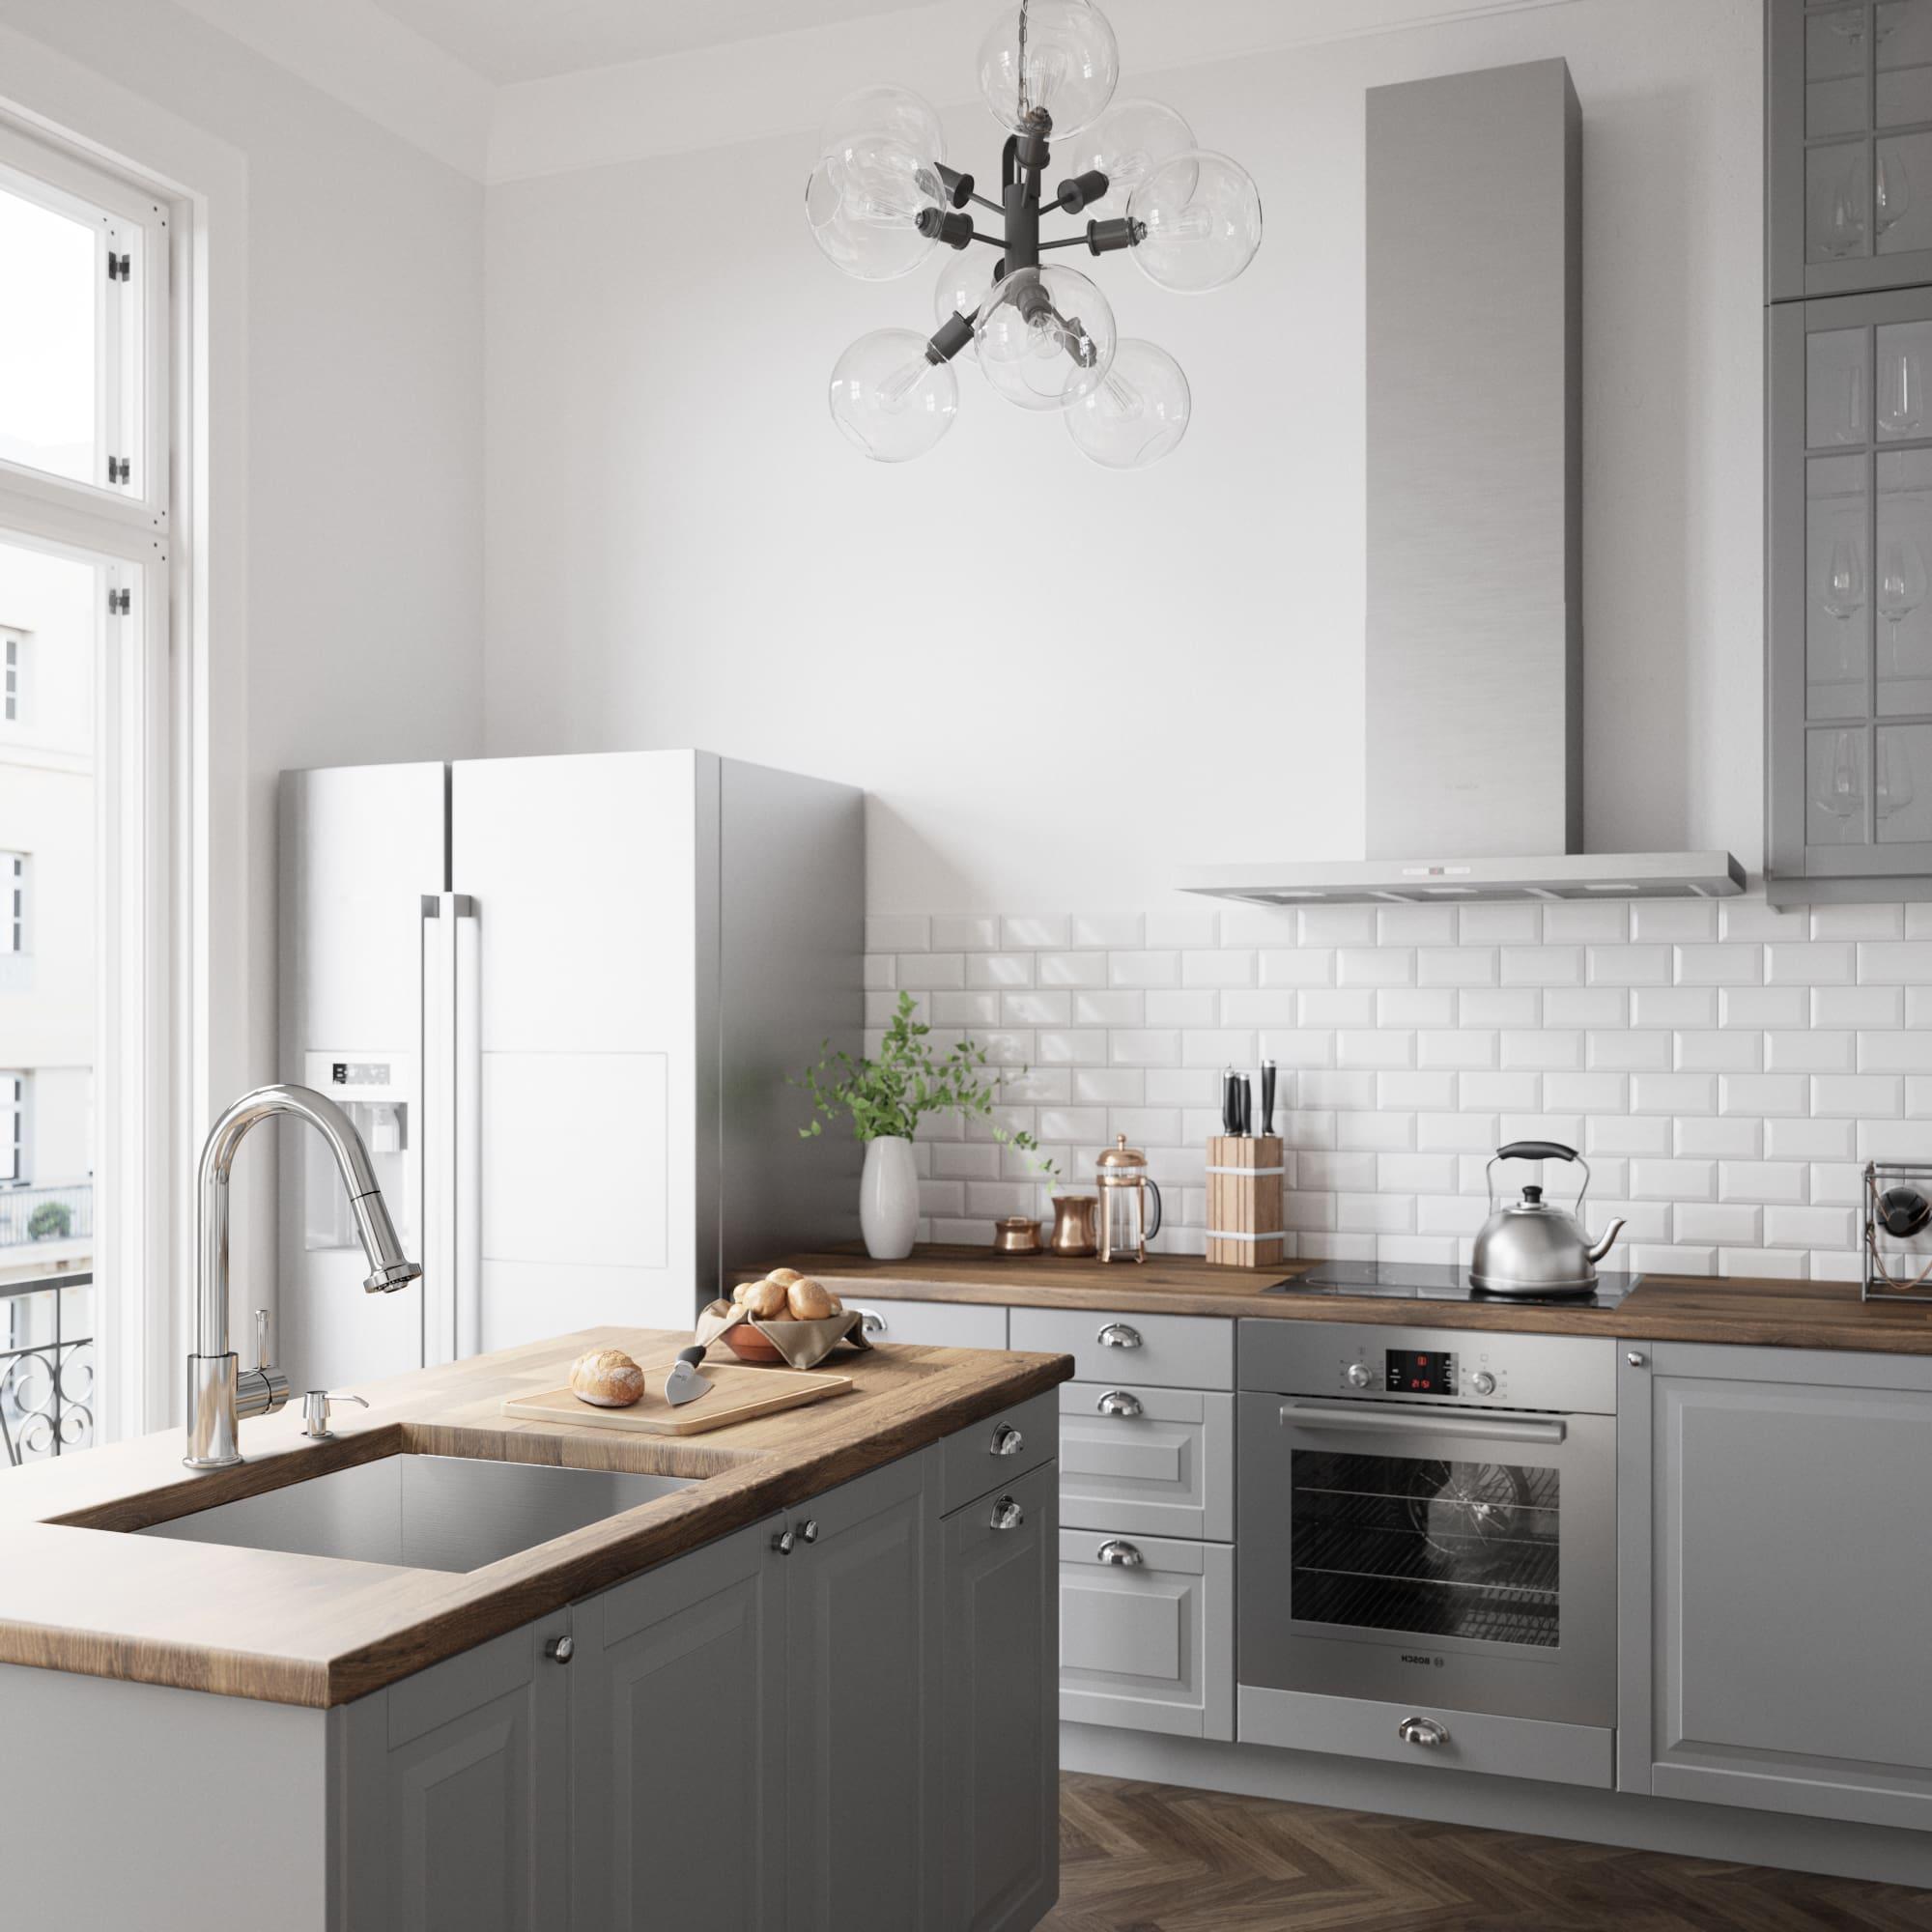 Vigo VG02002CH Chrome Harrison Pull-Out Spray Kitchen Faucet ...